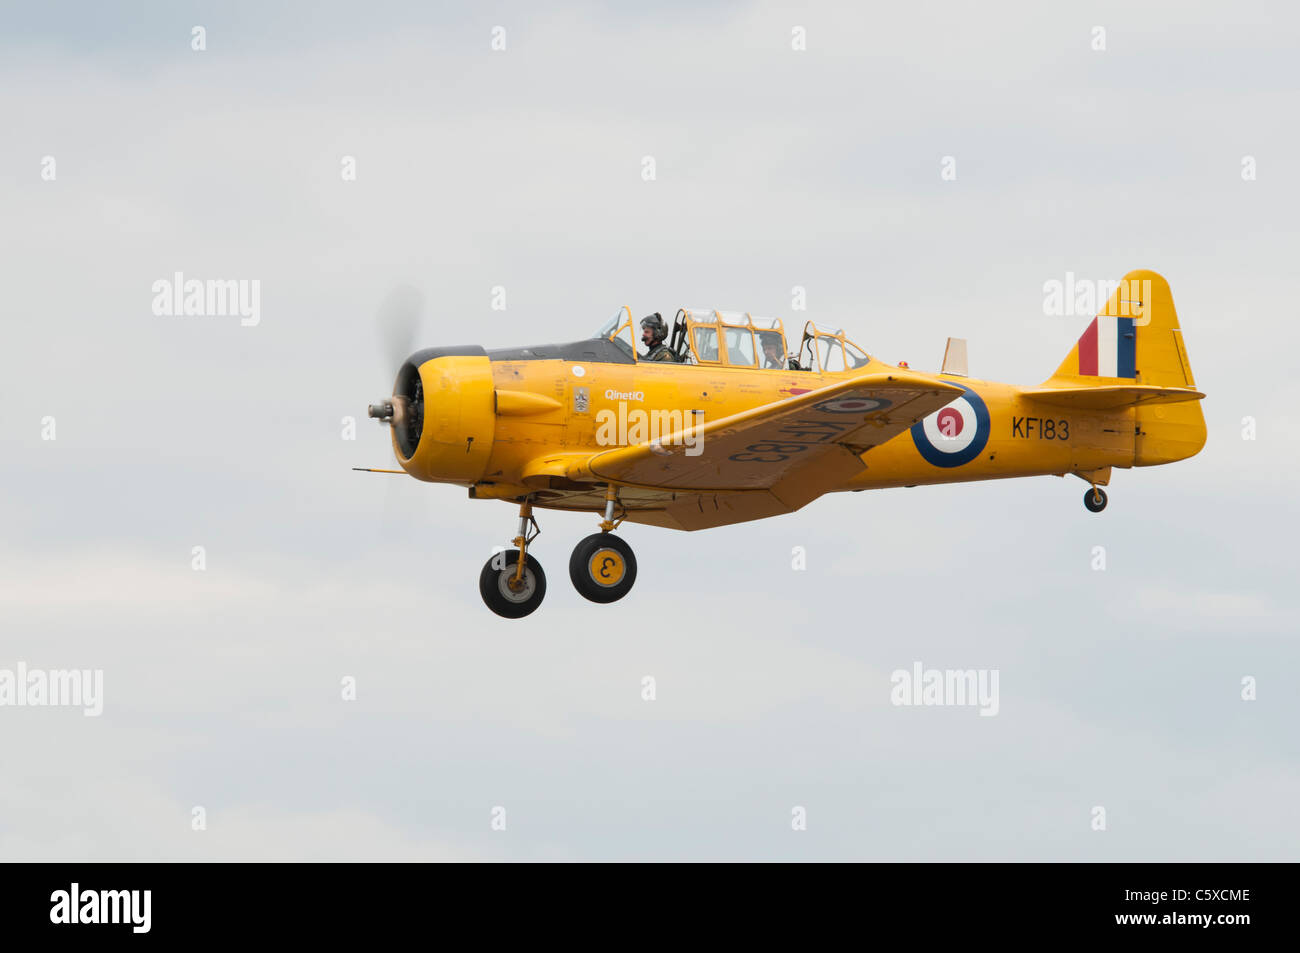 QinetiQ North American Texan or Harvard KF183 arrives at RAF Fairford for display at the 2011 Royal International - Stock Image